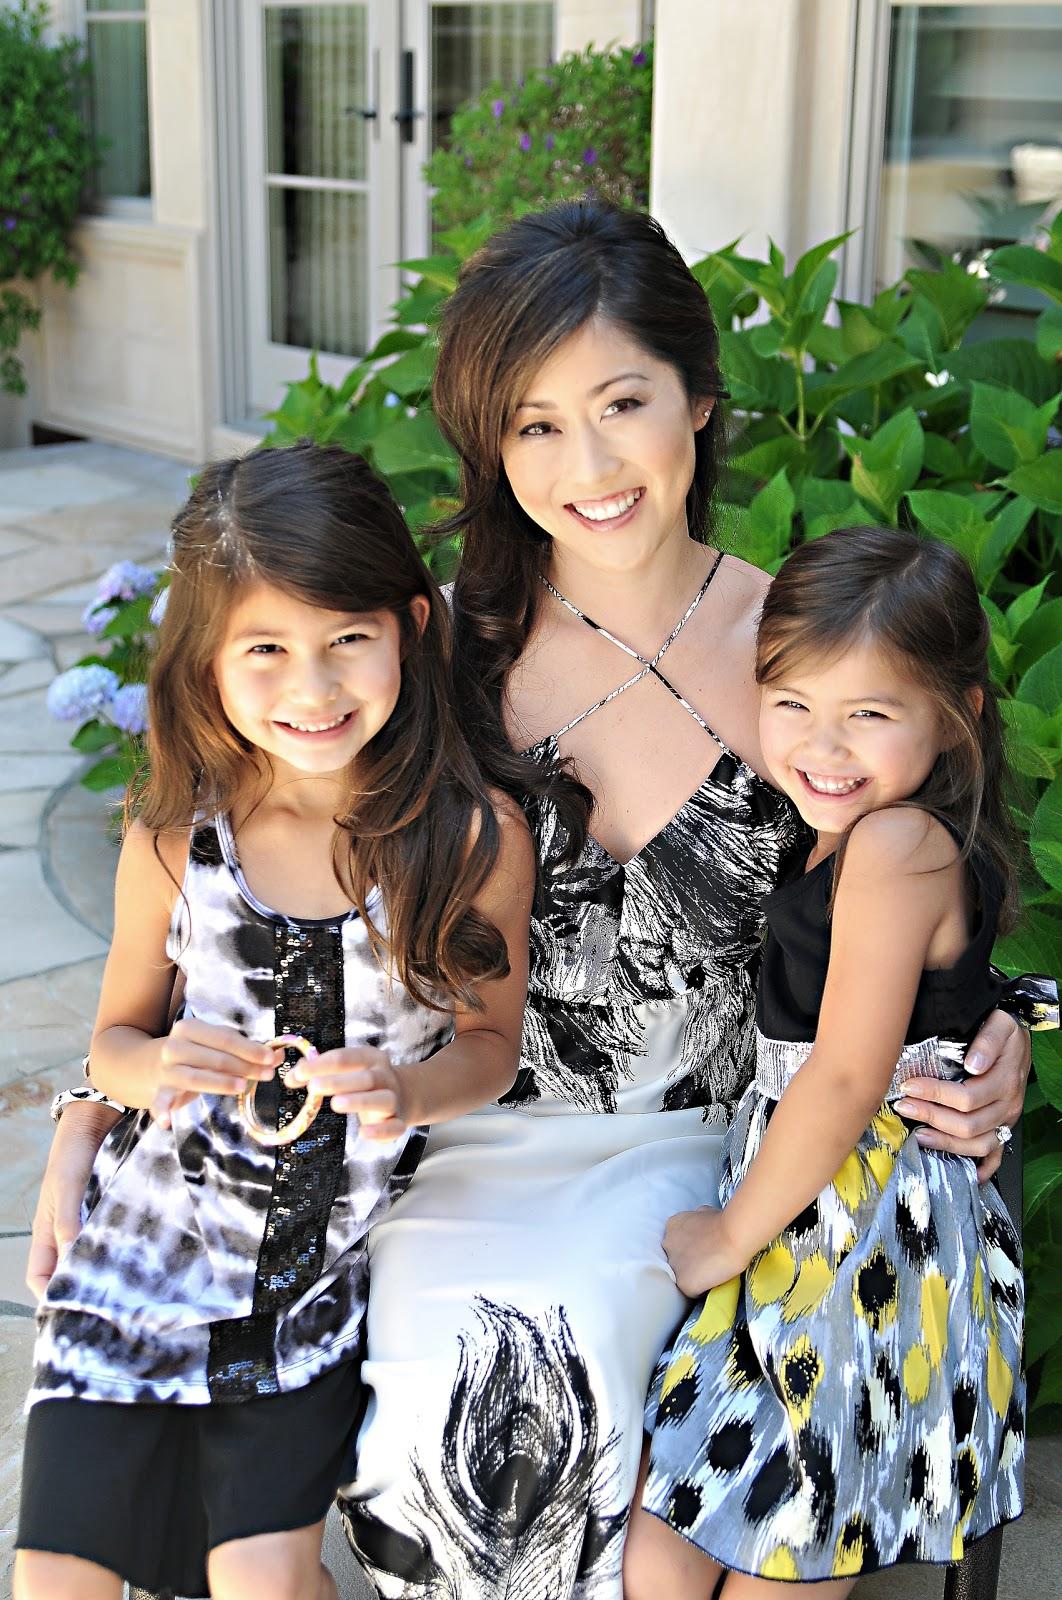 How Many Kids Does Kristi Yamaguchi Have